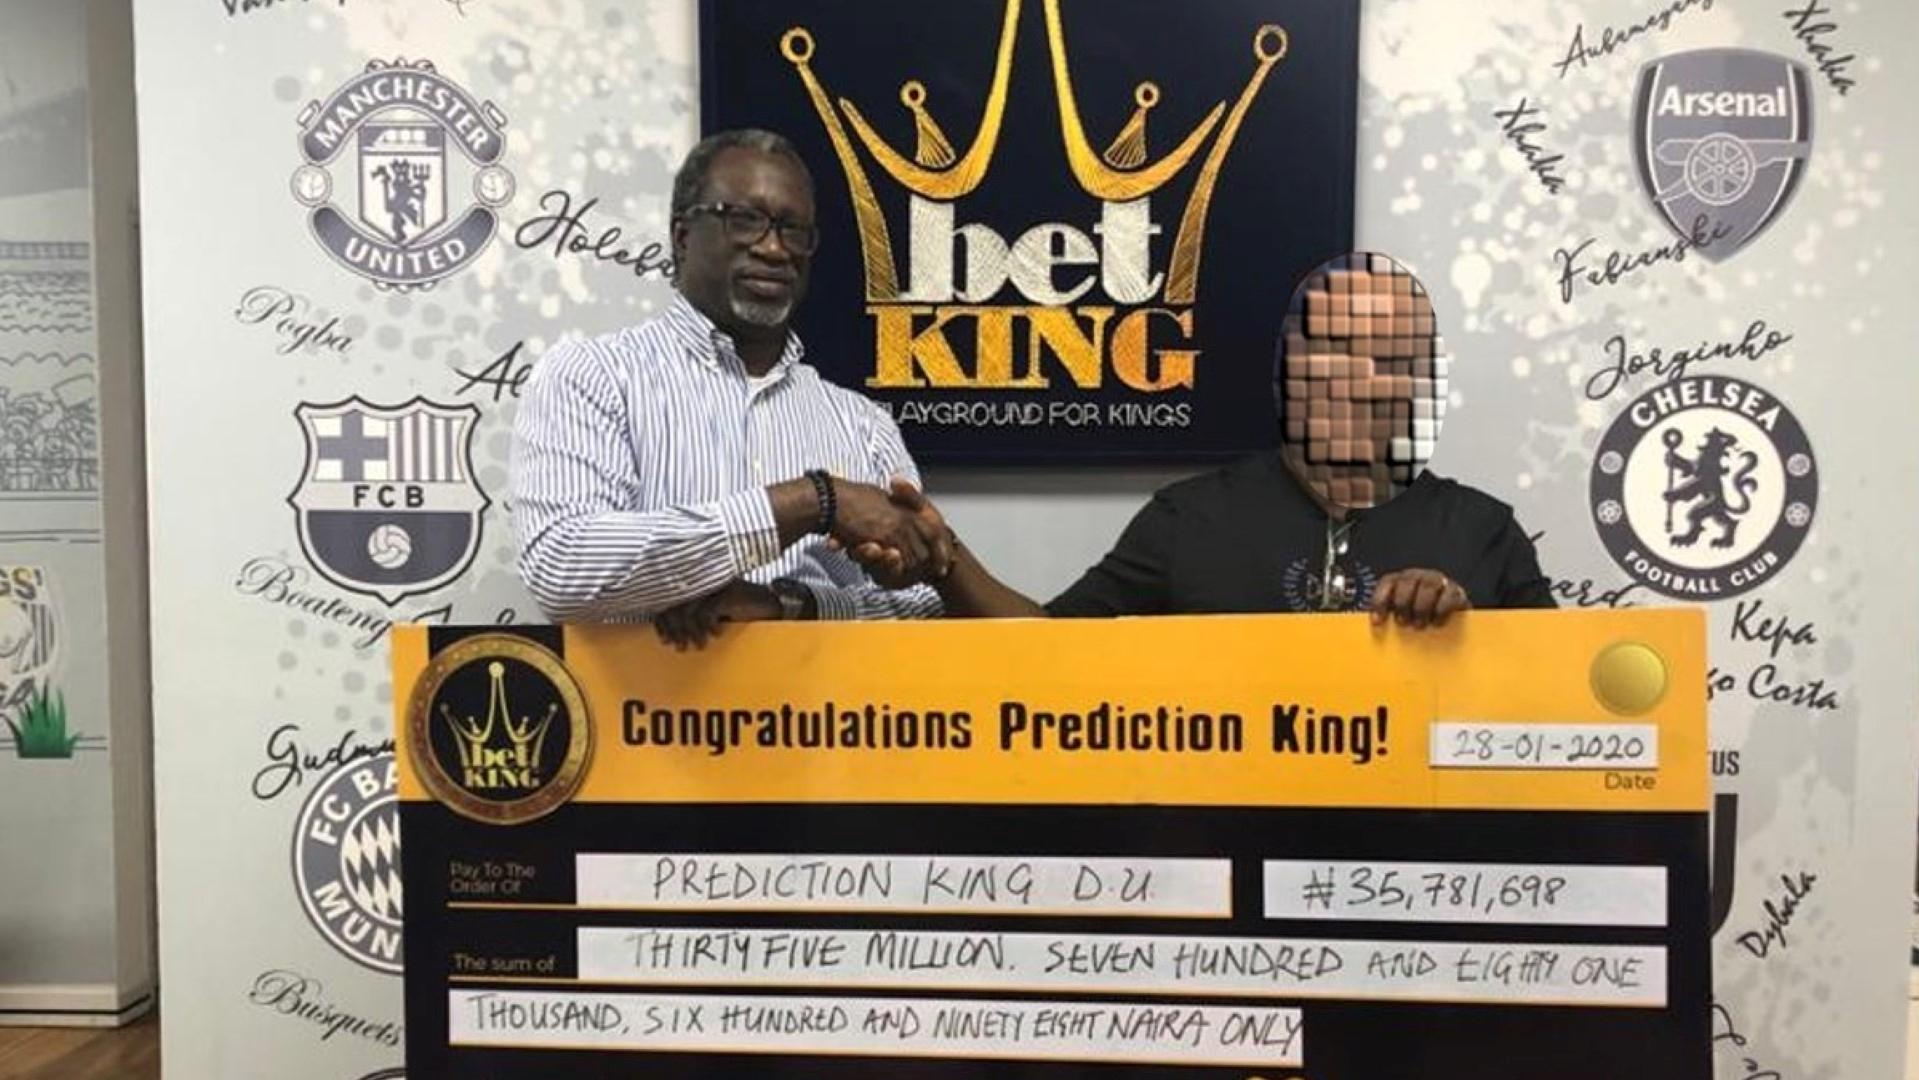 Winners sports betting uganda revenue hkjc football betting rules